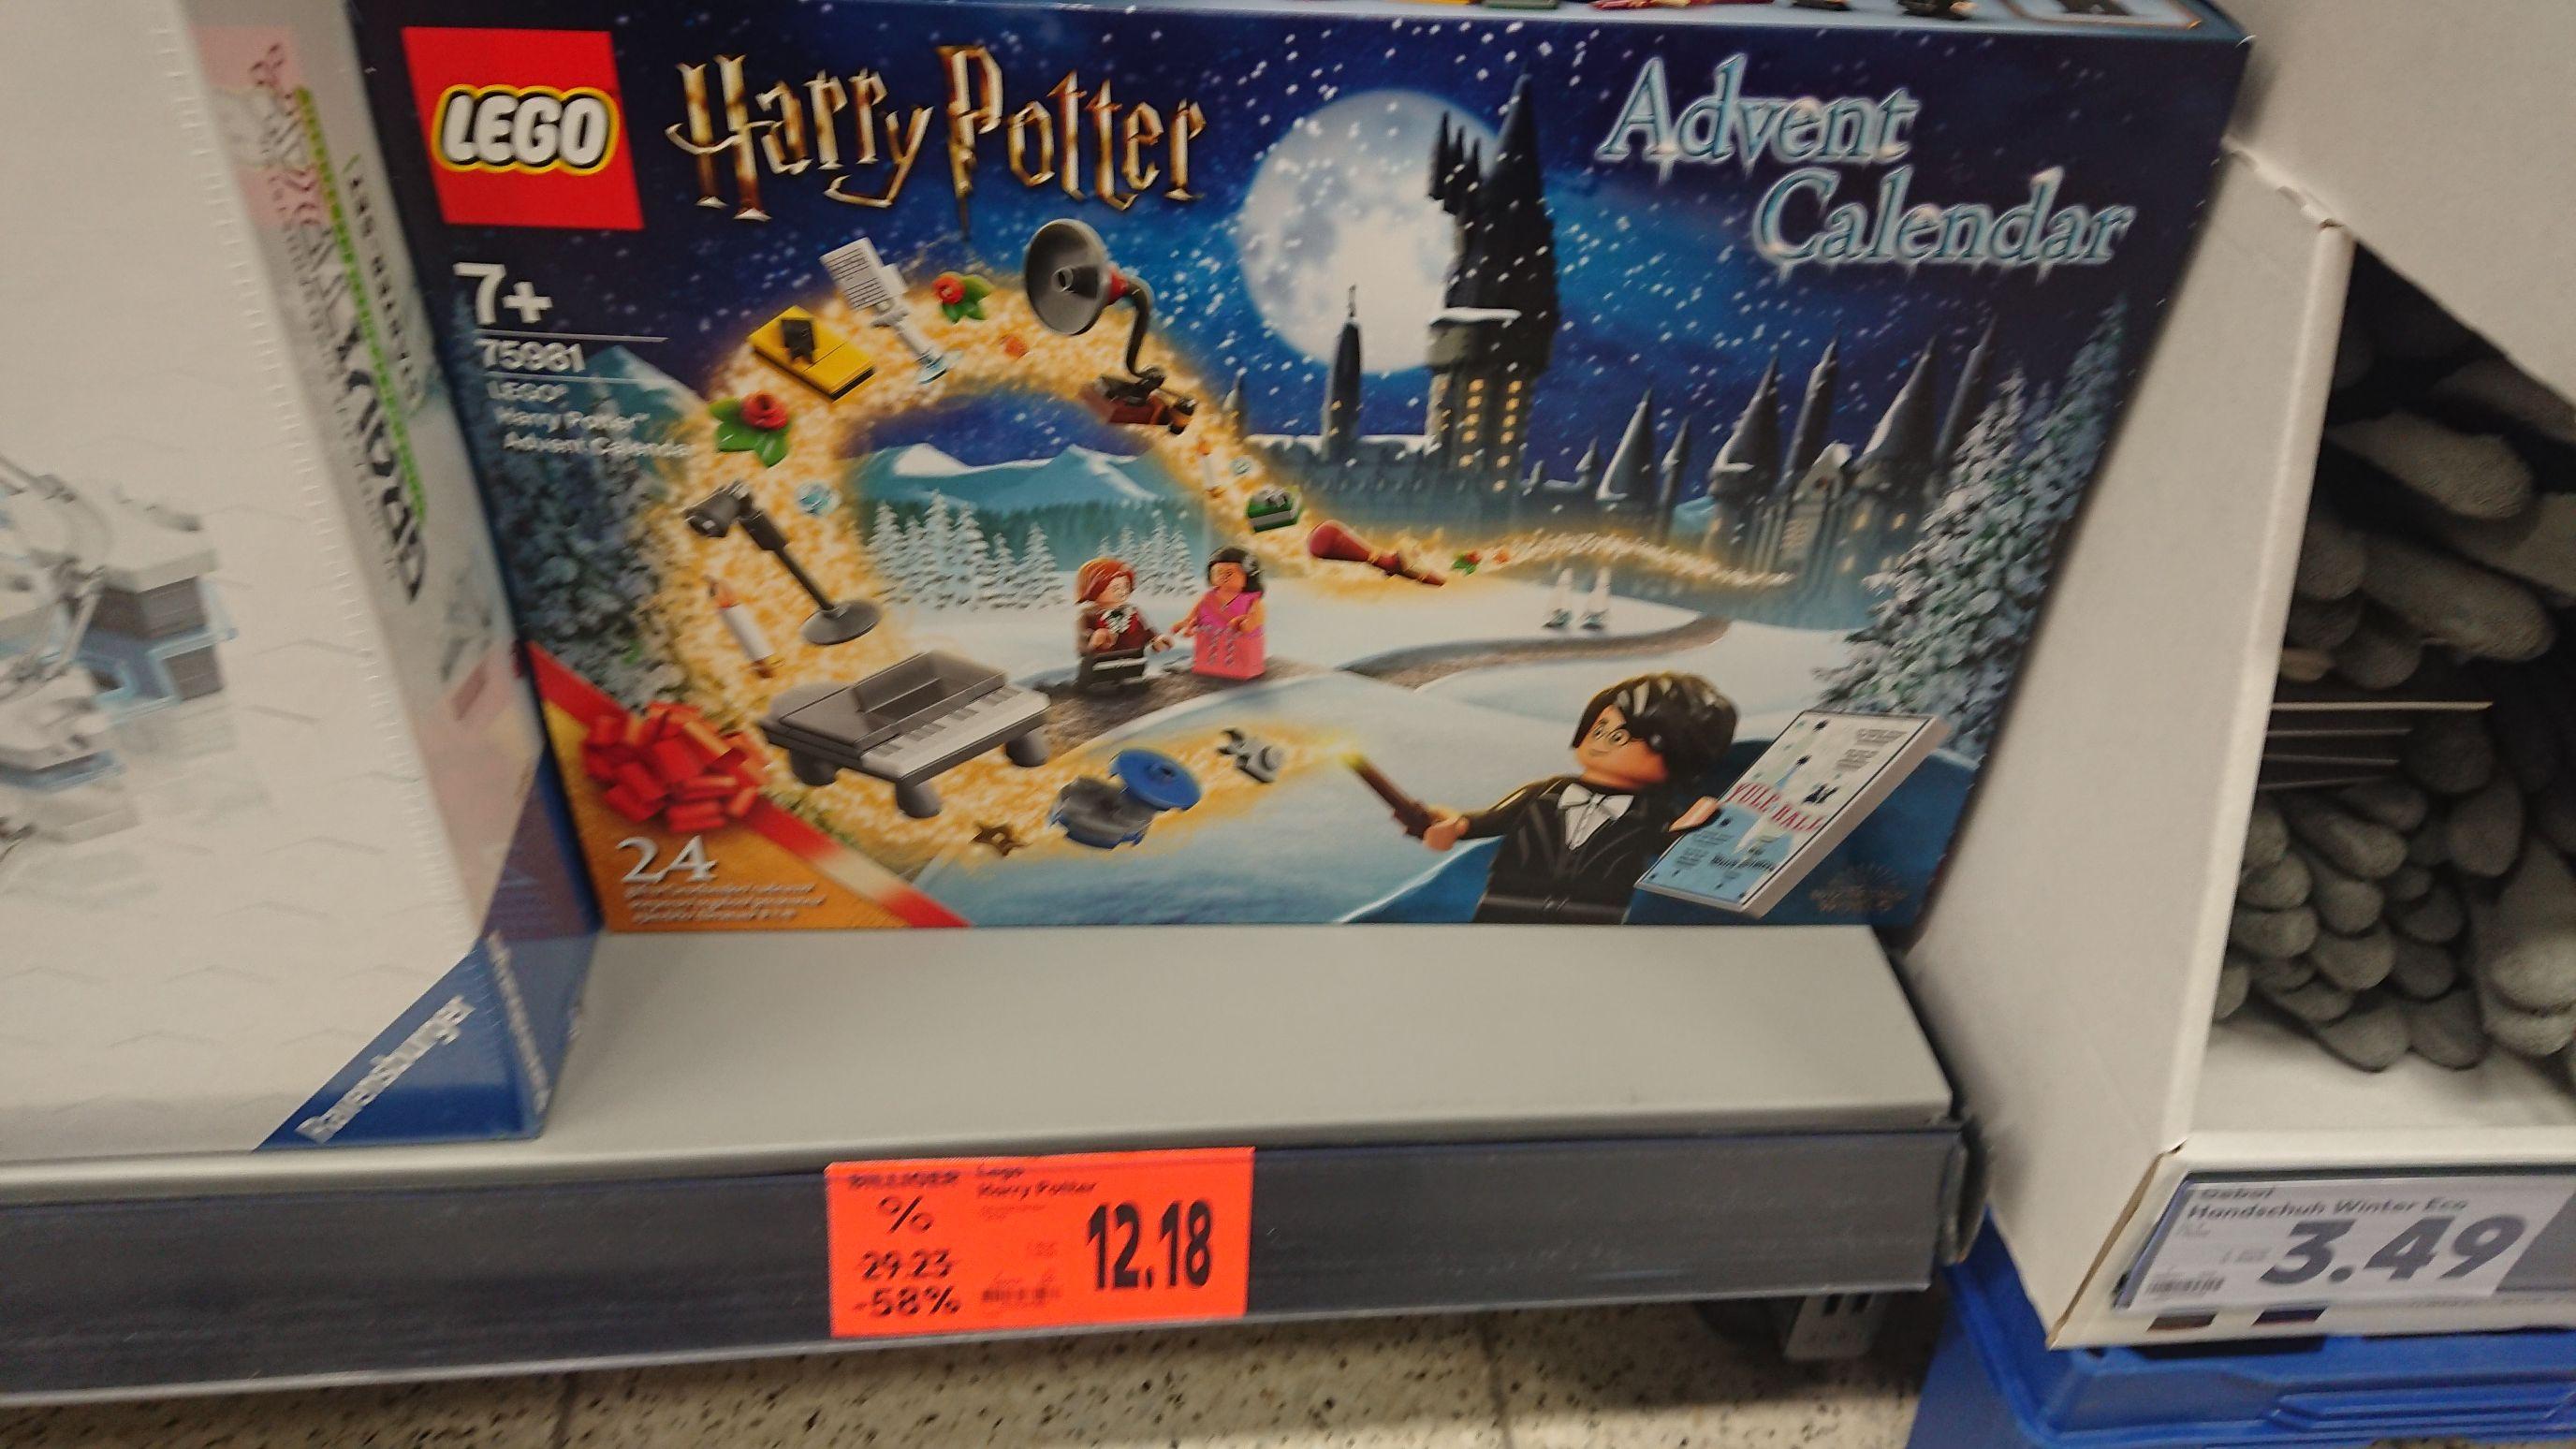 Lego Harry Potter Adventskalender Lokal Kaufland Leipzig Paunsdorf Center